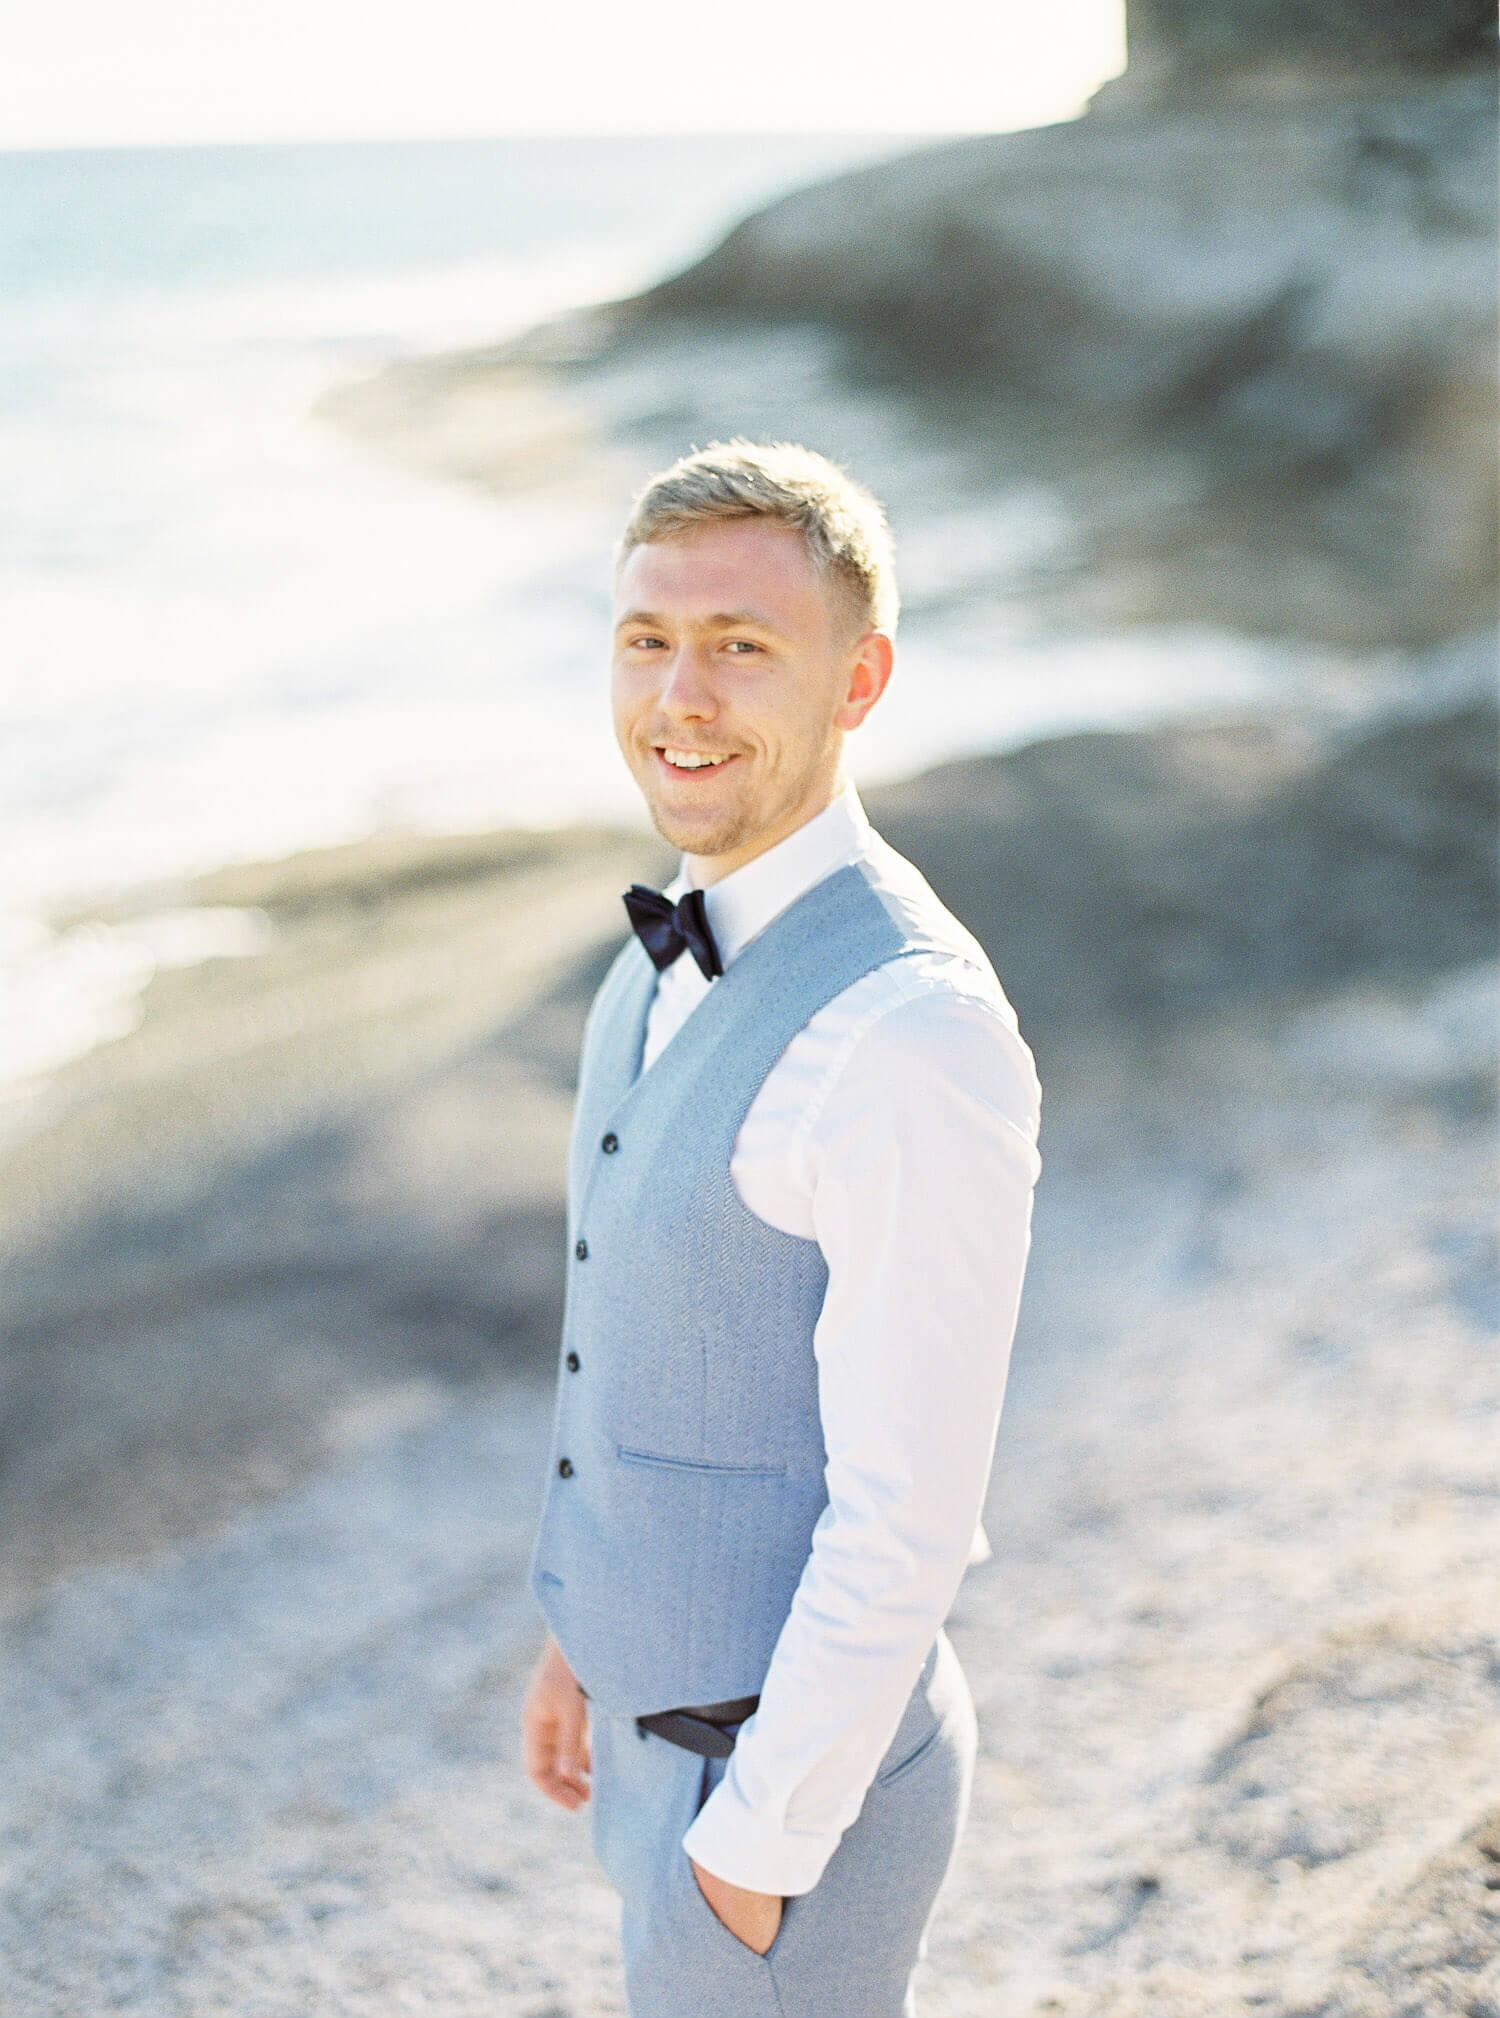 portrait of a groom film wedding photographer in Tenerife Spain